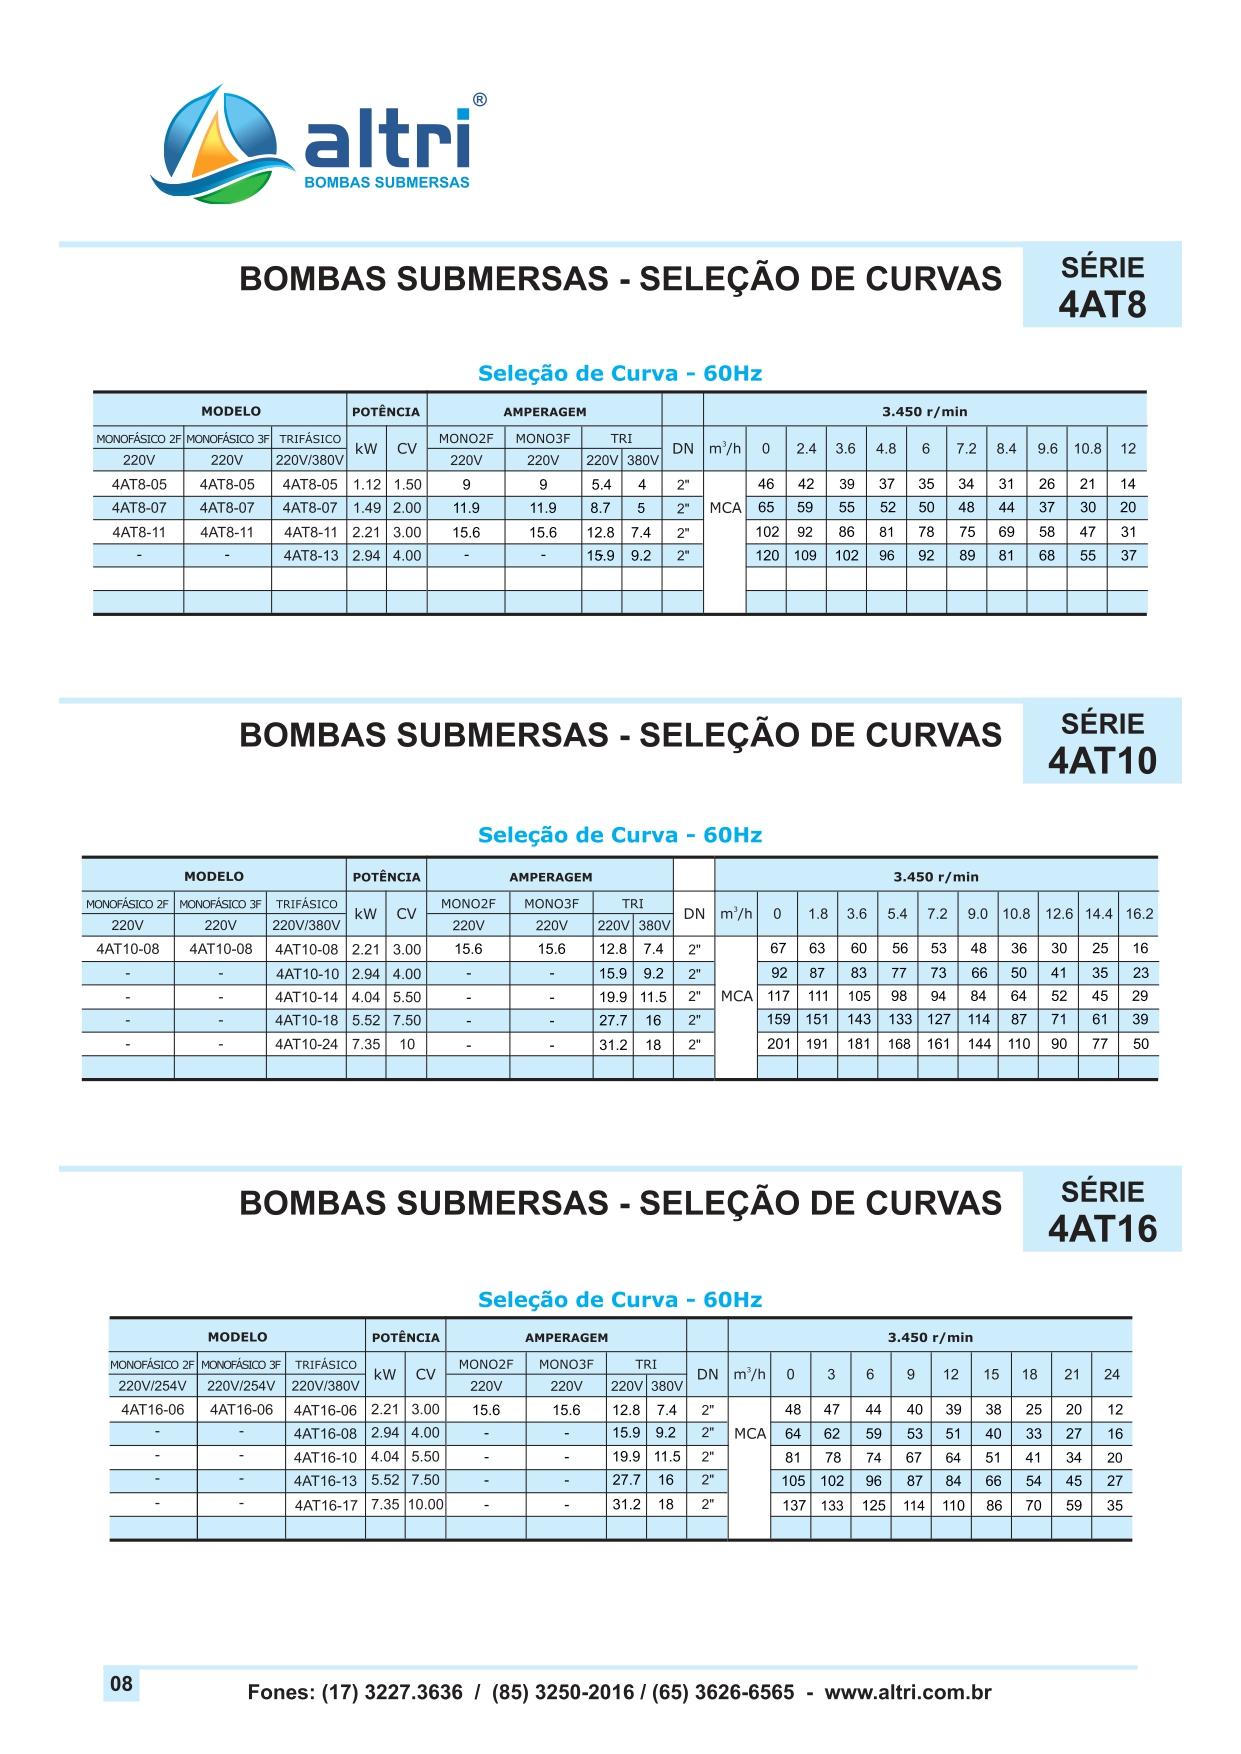 CATALOGO DE PRODUTOS ALTRI 2021 - WEB_page-0010